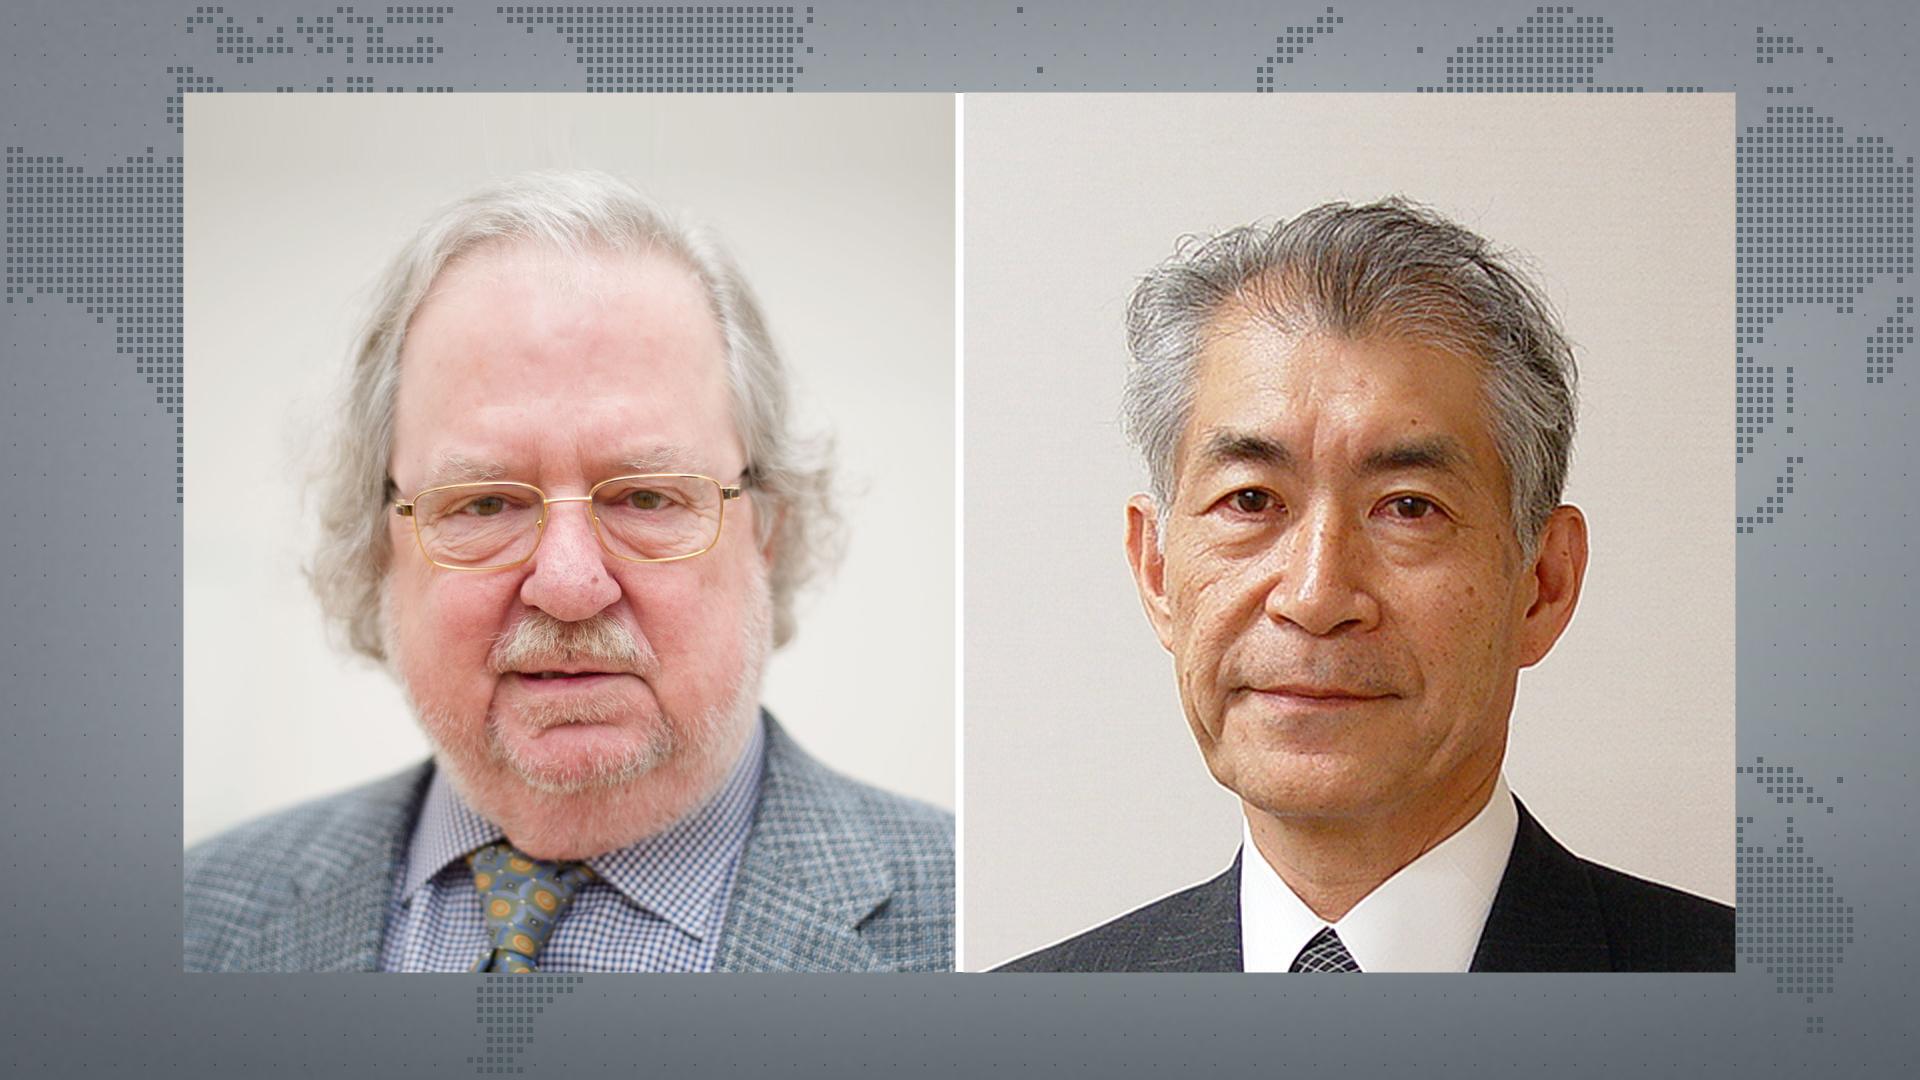 Nobelpreisträger für Medizin 2018: James Allison und Tasuku Honjo